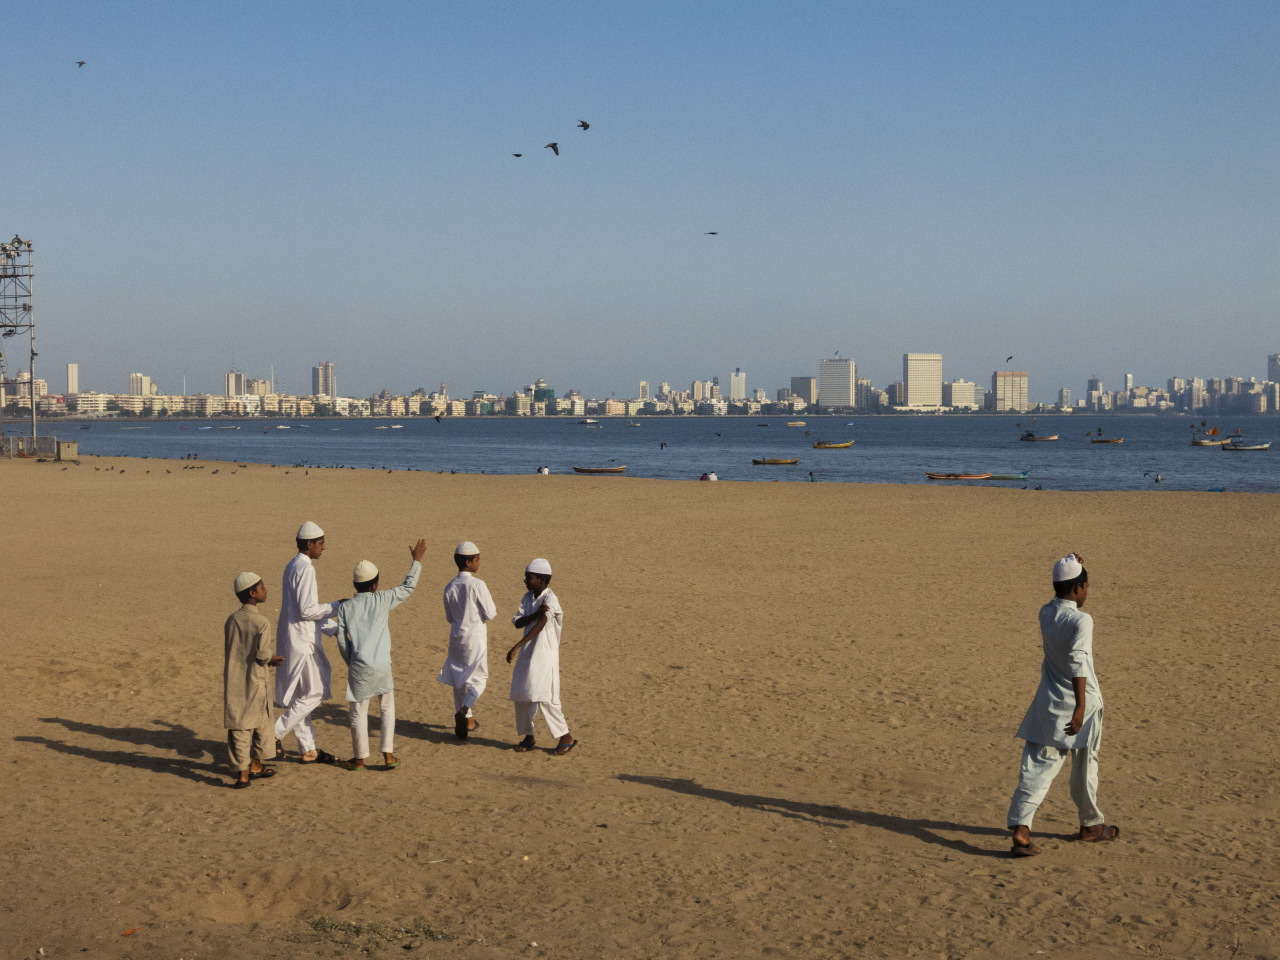 mumbai_buzz_web_size_024.JPG